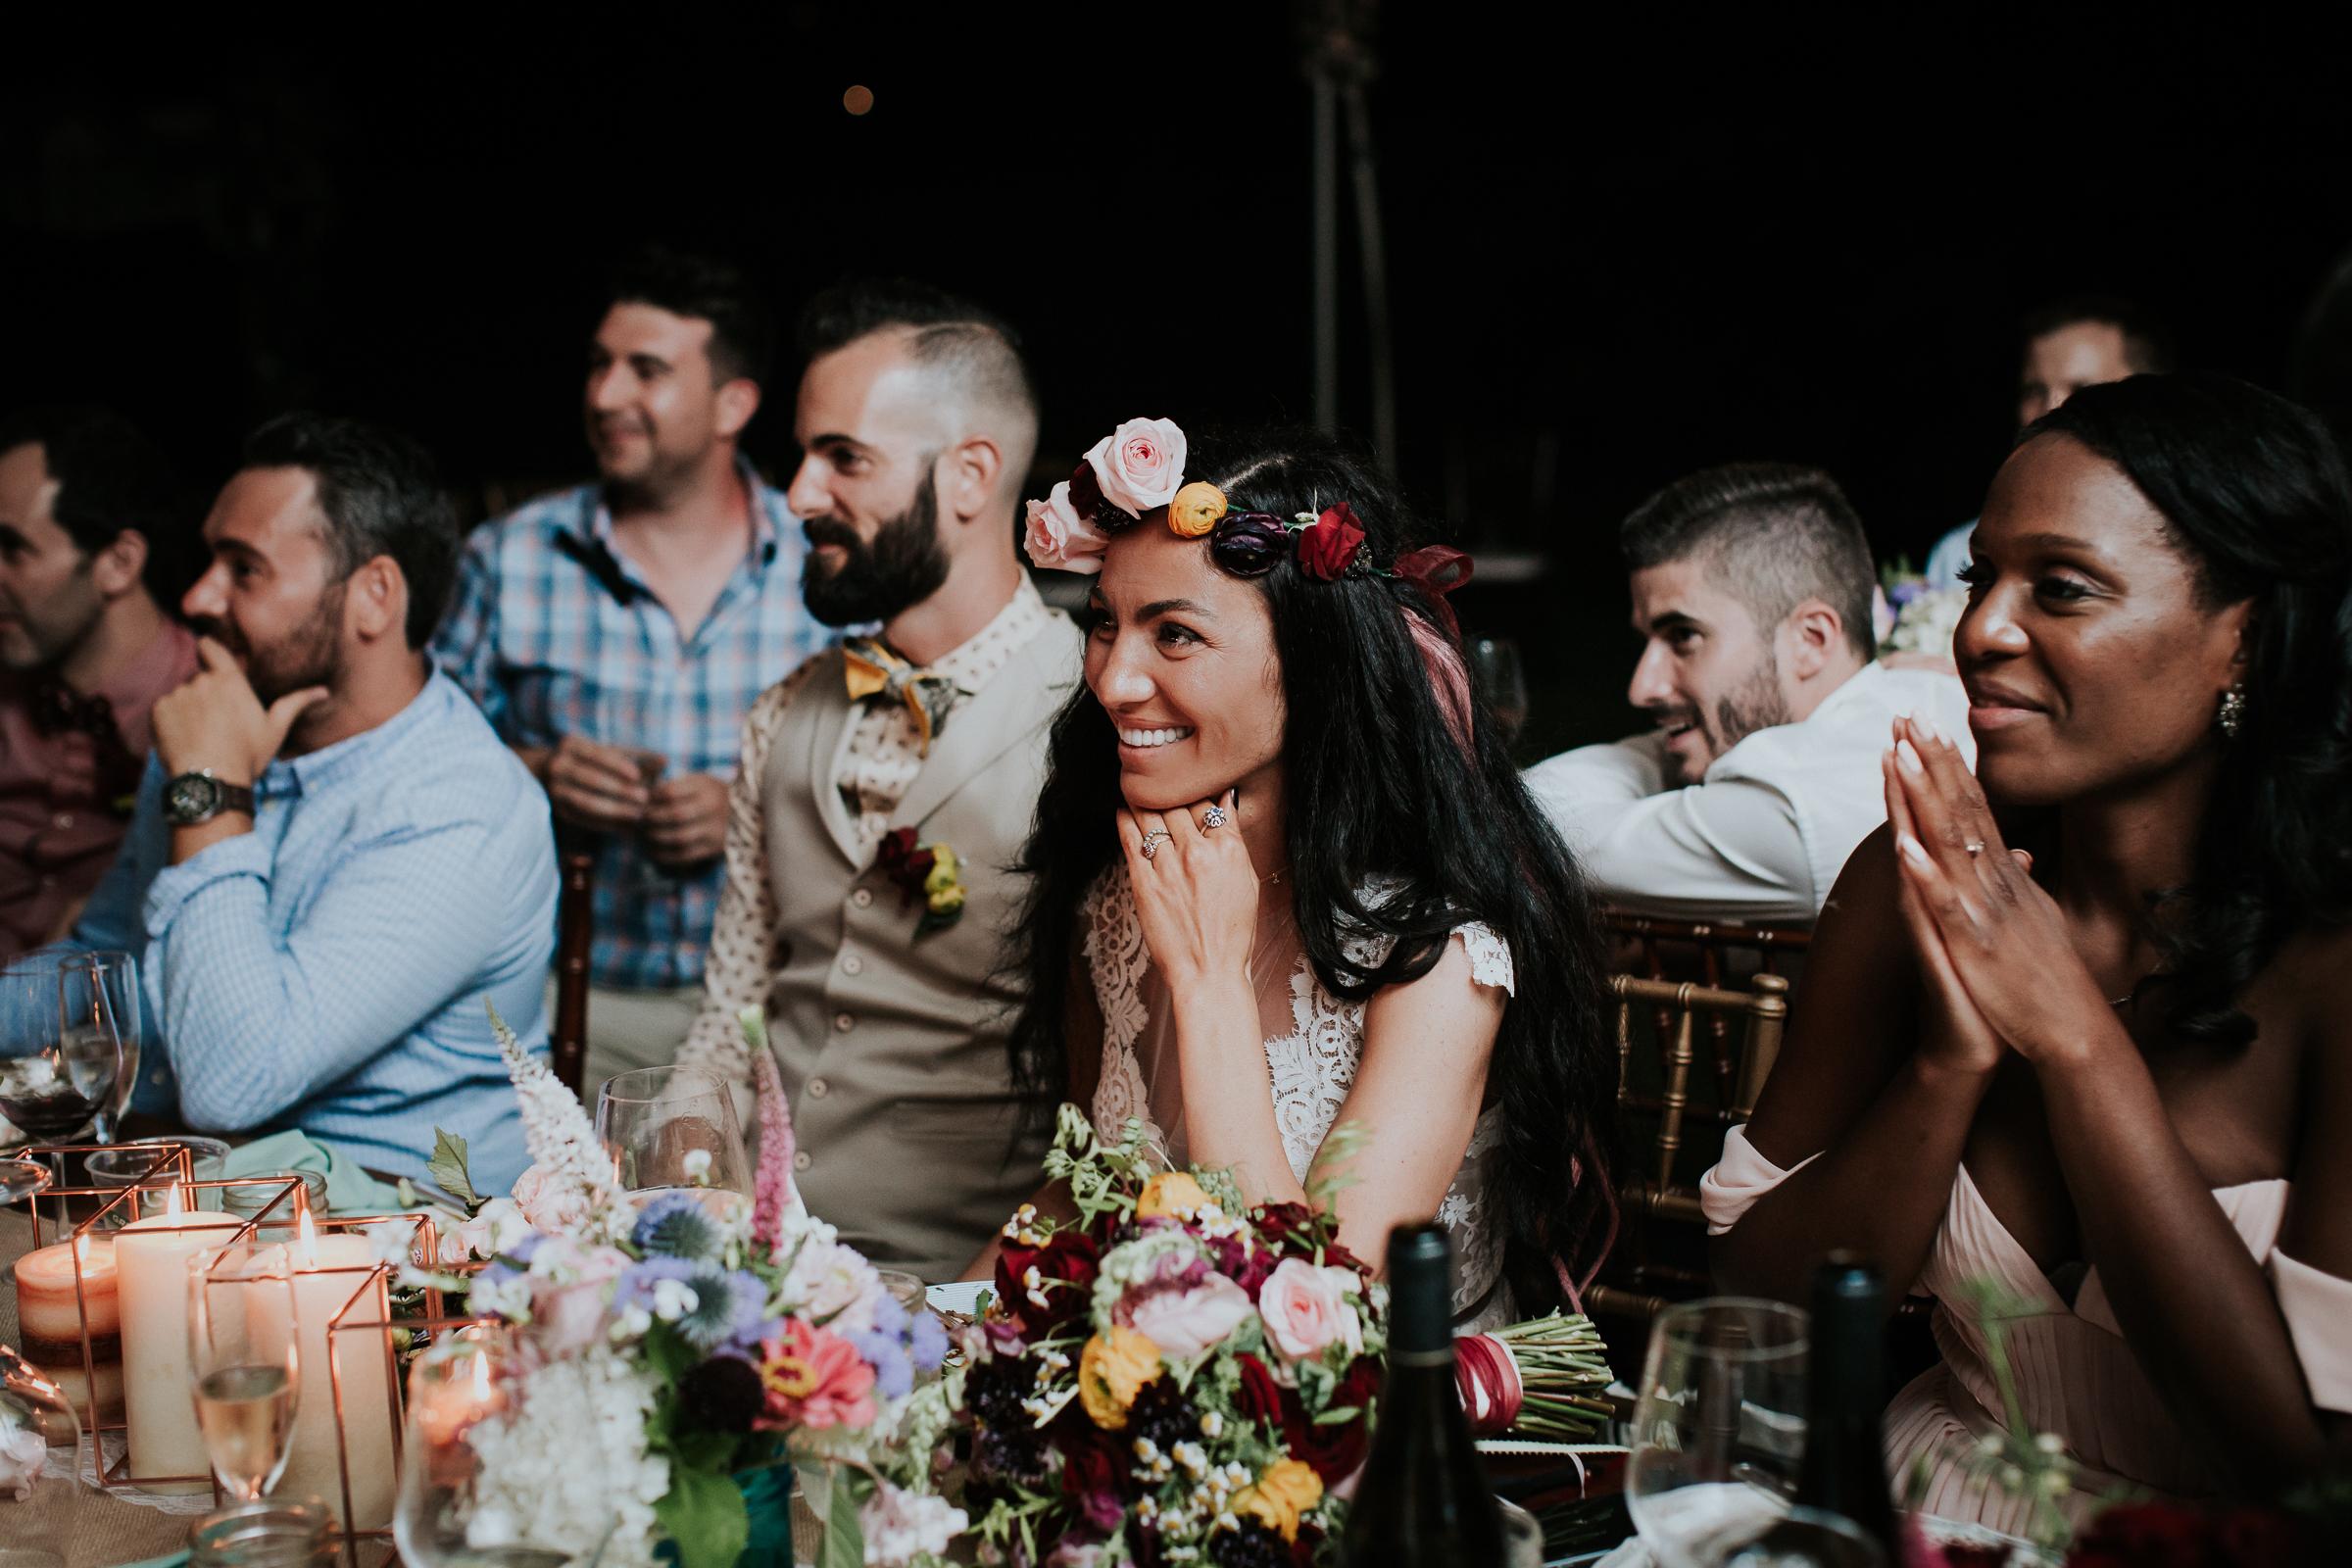 Backyard-Intimate-Adventurous-Destination-Wedding-Darien-Connecticut-Documentary-Wedding-Photography-119.jpg